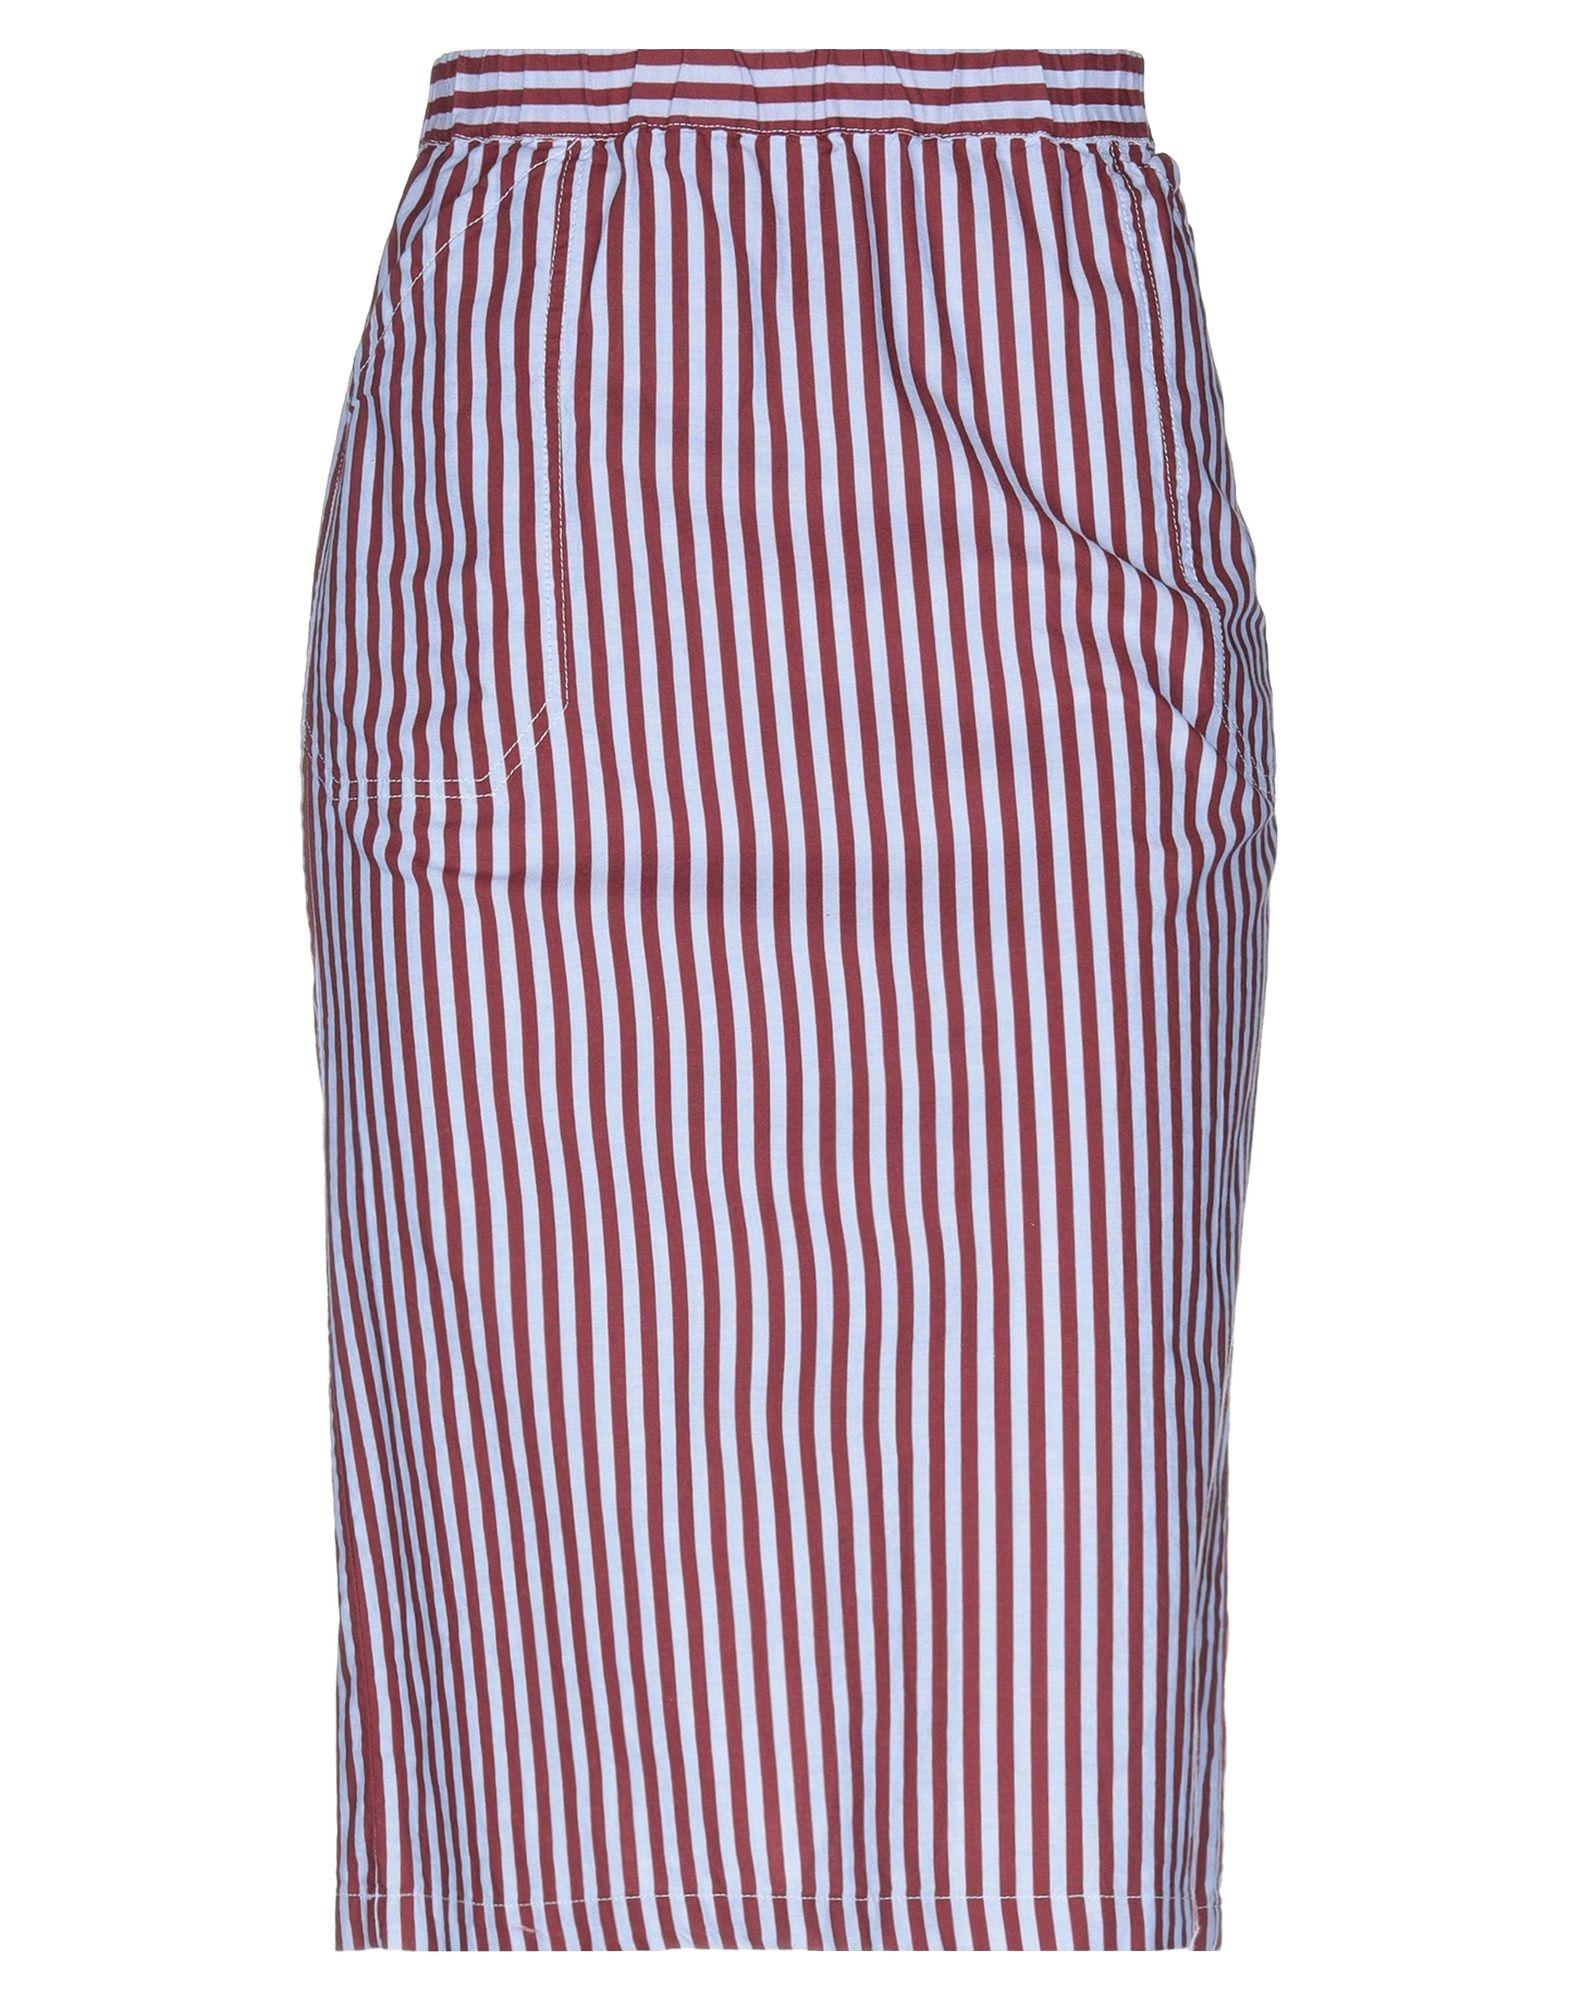 MASSIMO ALBA Юбка длиной 3/4 alpha massimo rebecchi платье длиной 3 4